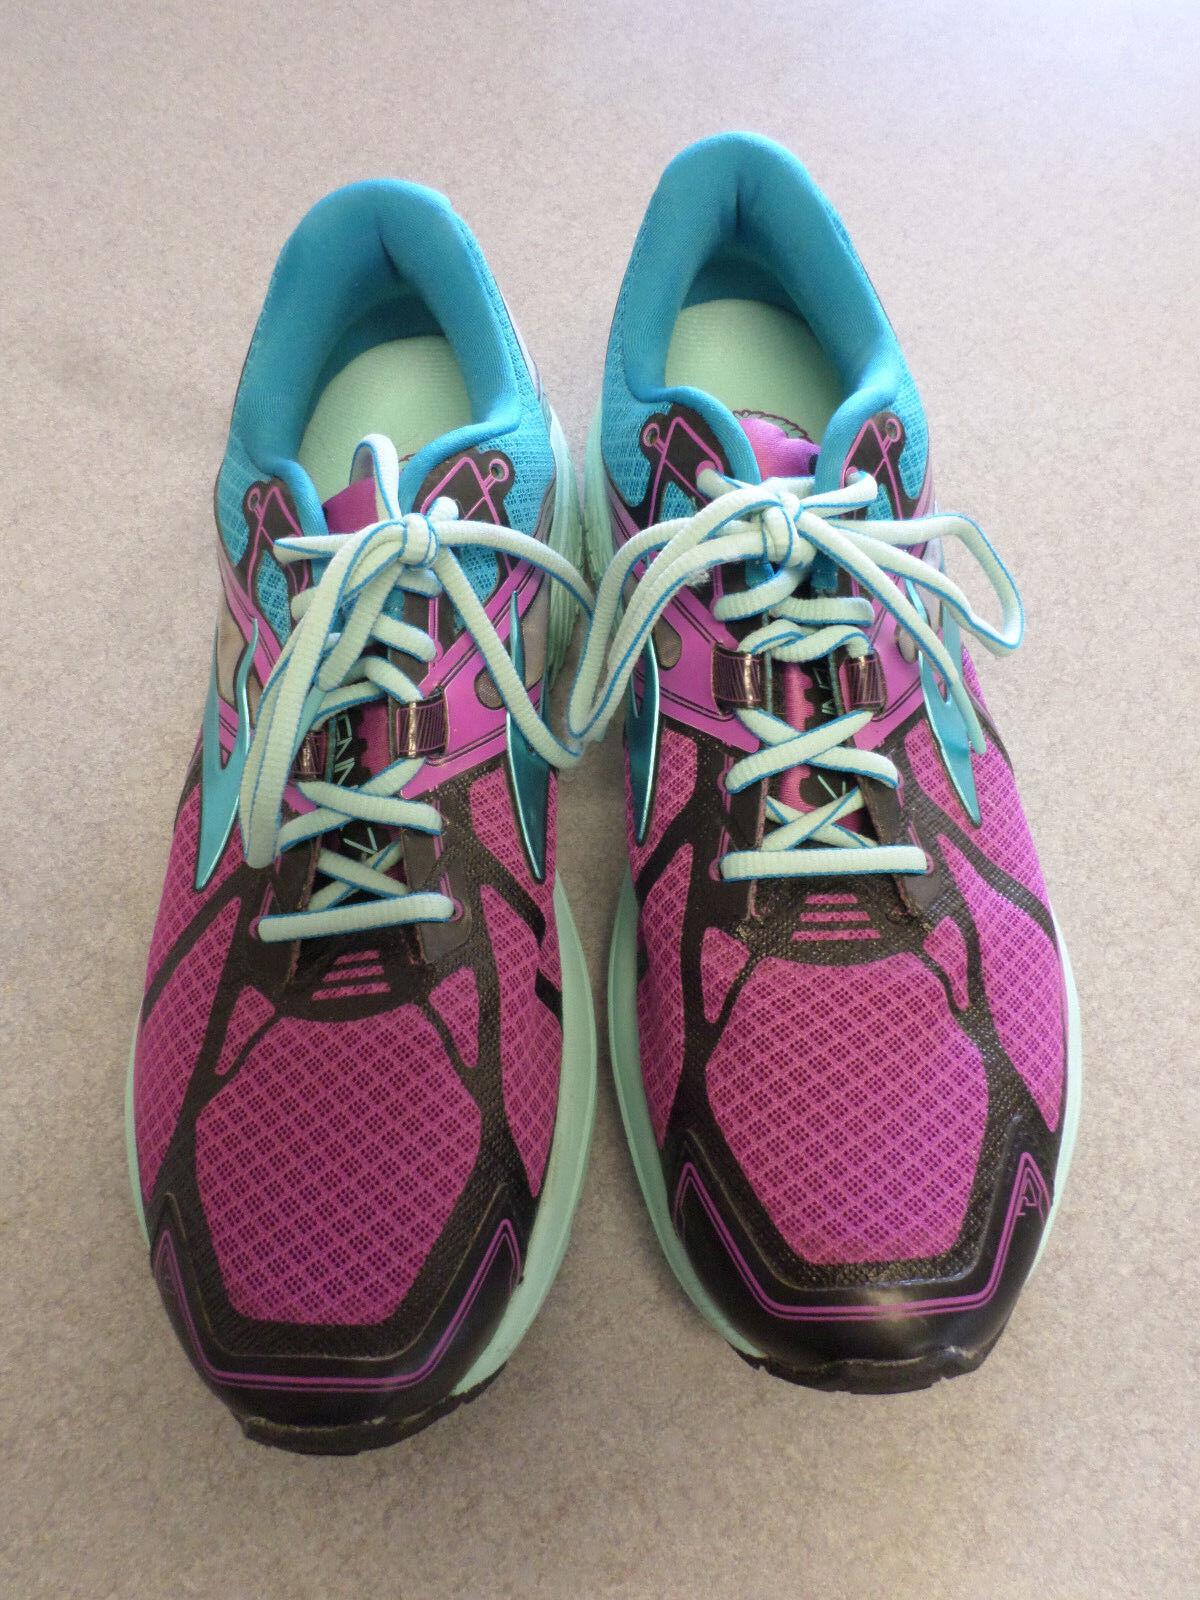 Brooks  Ravenna 7  purple and bluee running shoes. Women's 12 (eur 44.5)